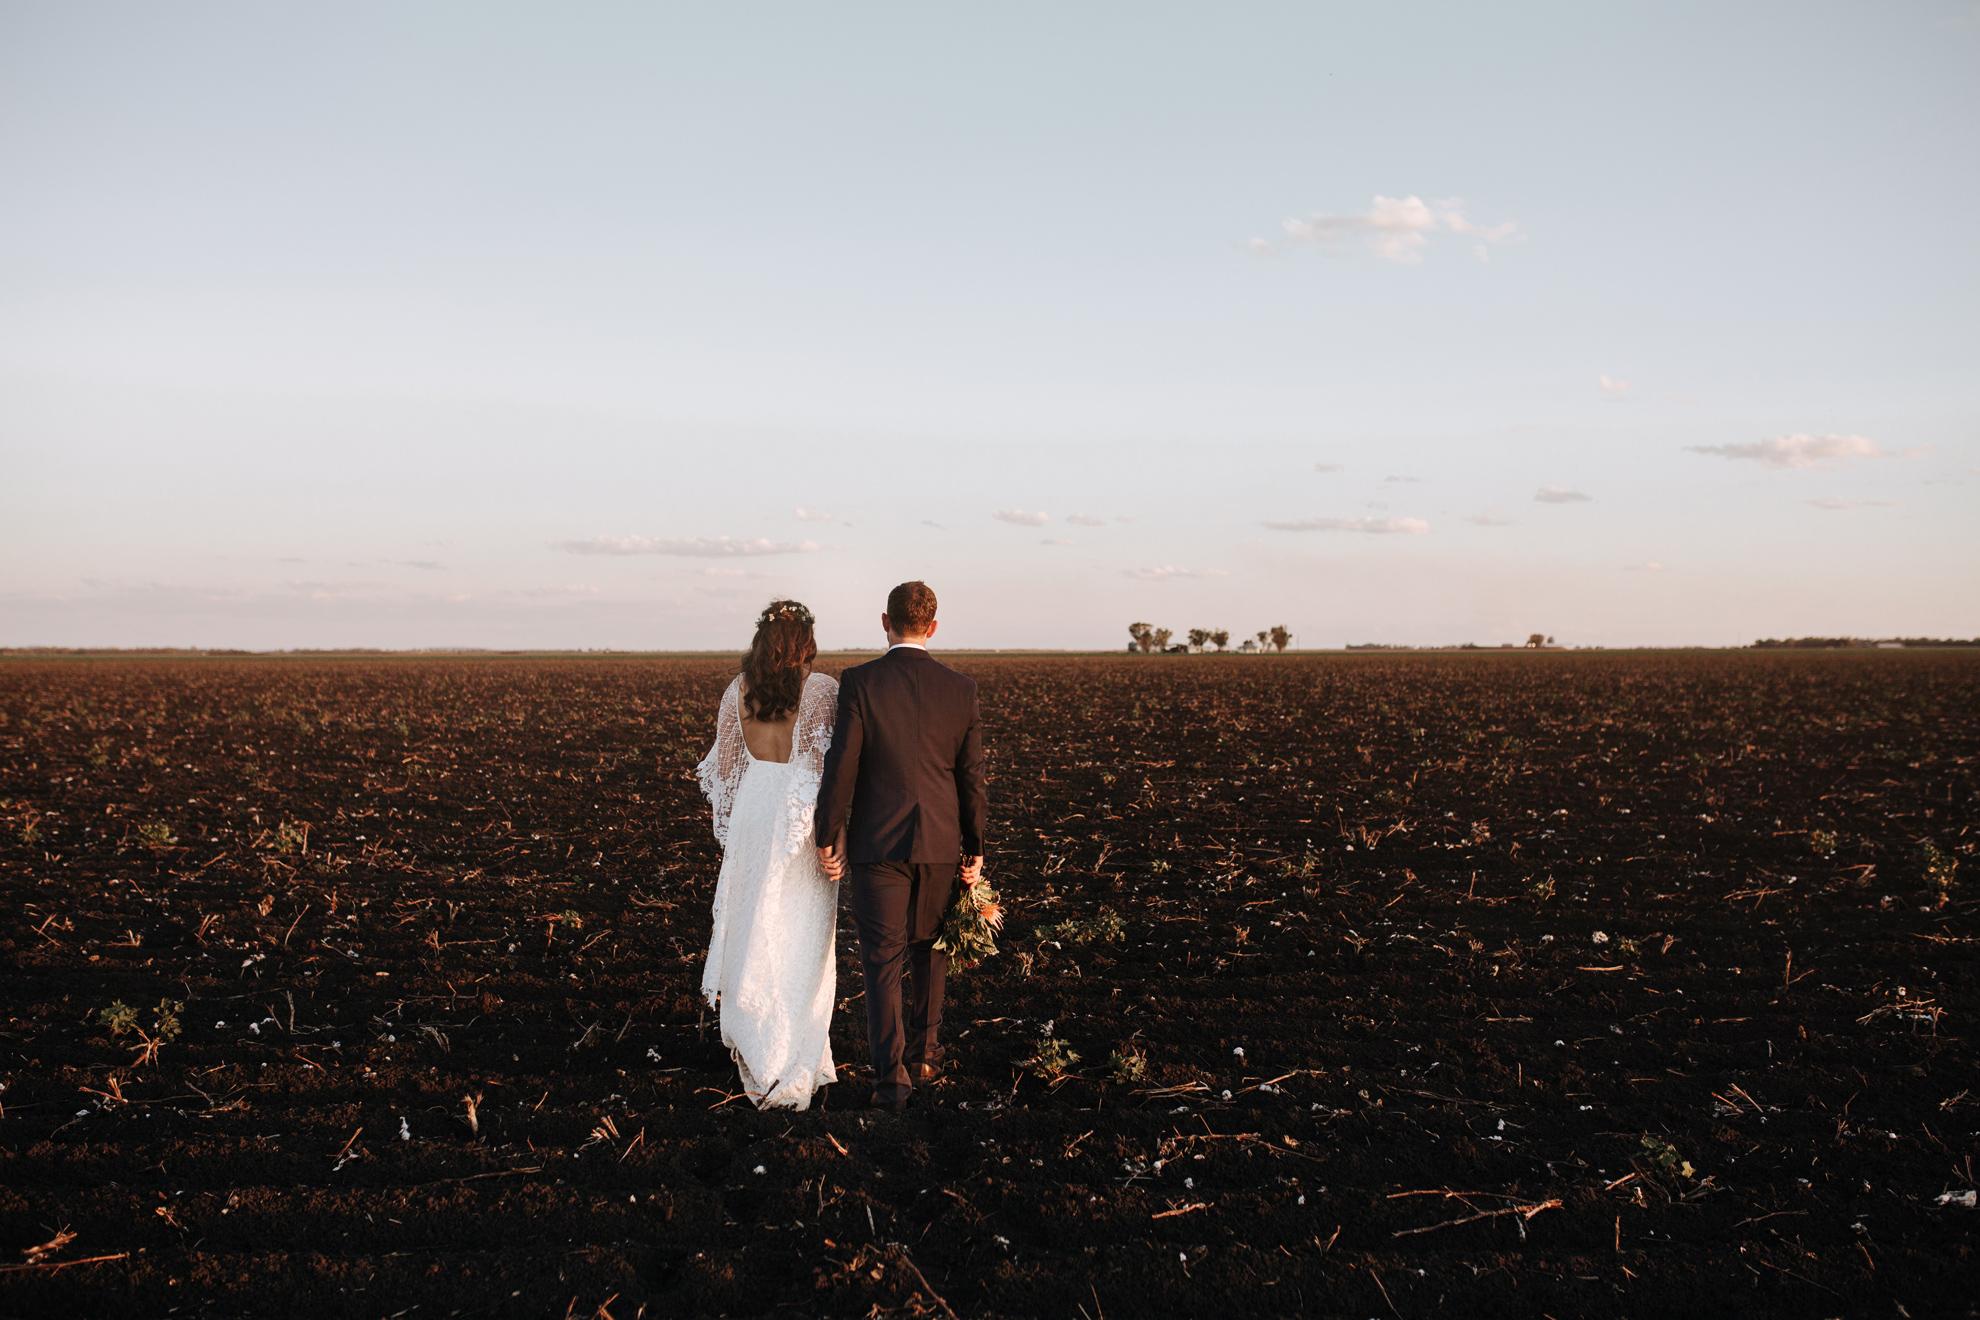 062-Jason_Jessie_Dalby_Country_Wedding.jpg